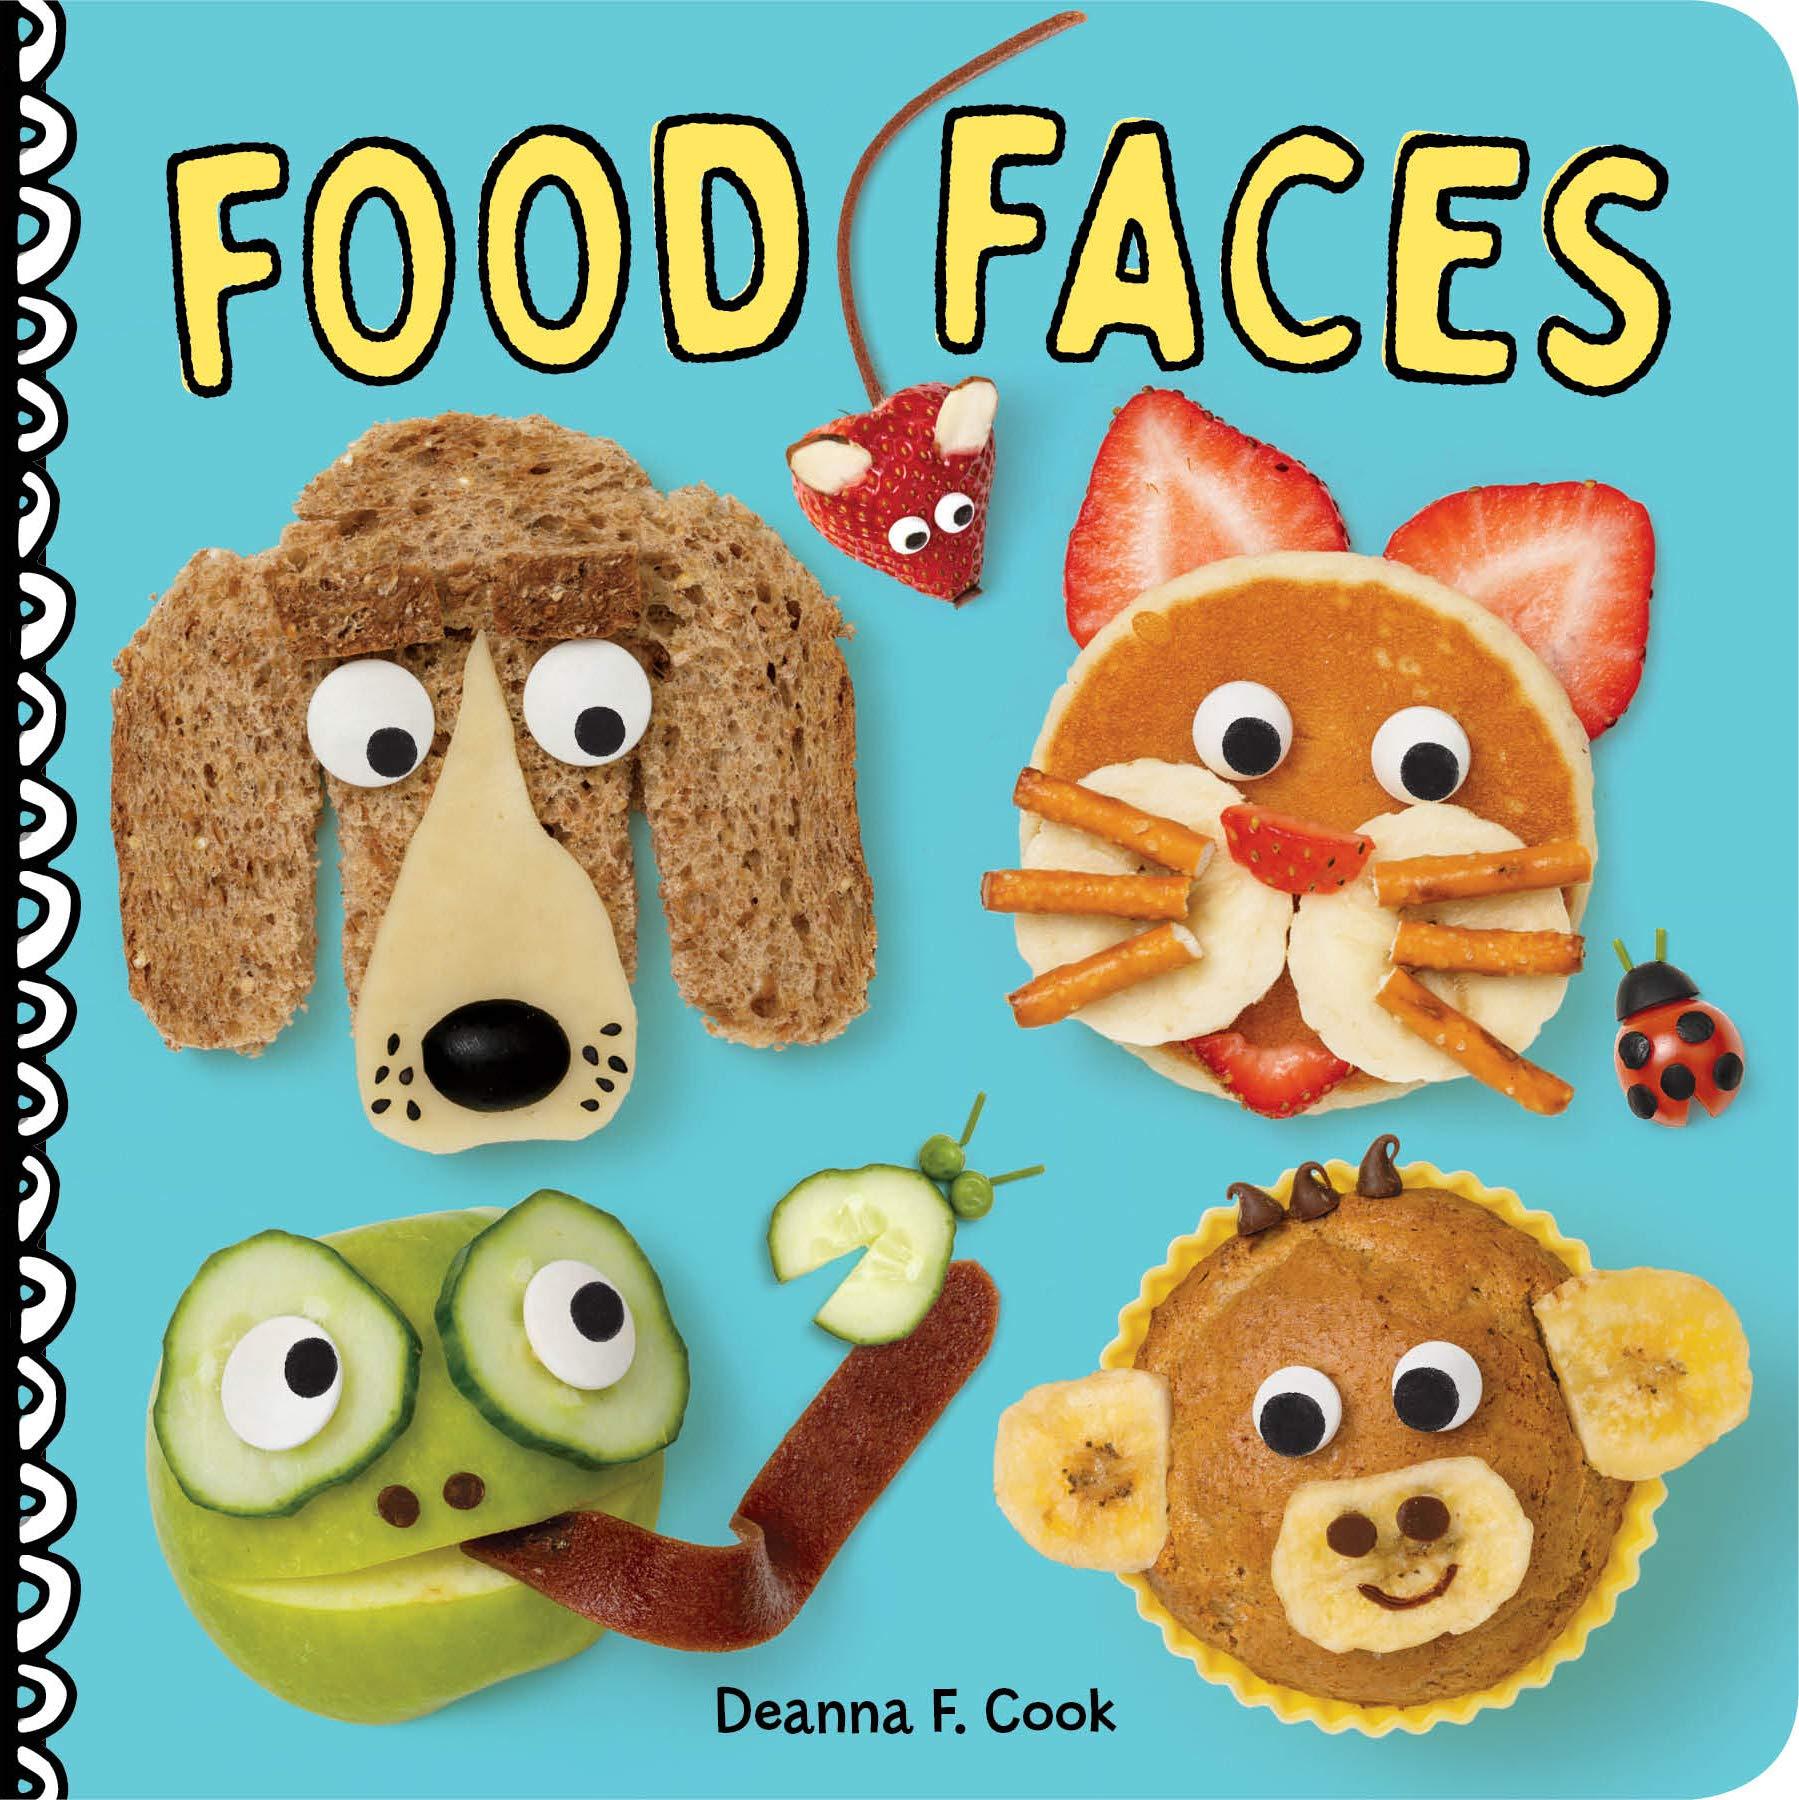 Food - Food Faces Board Book